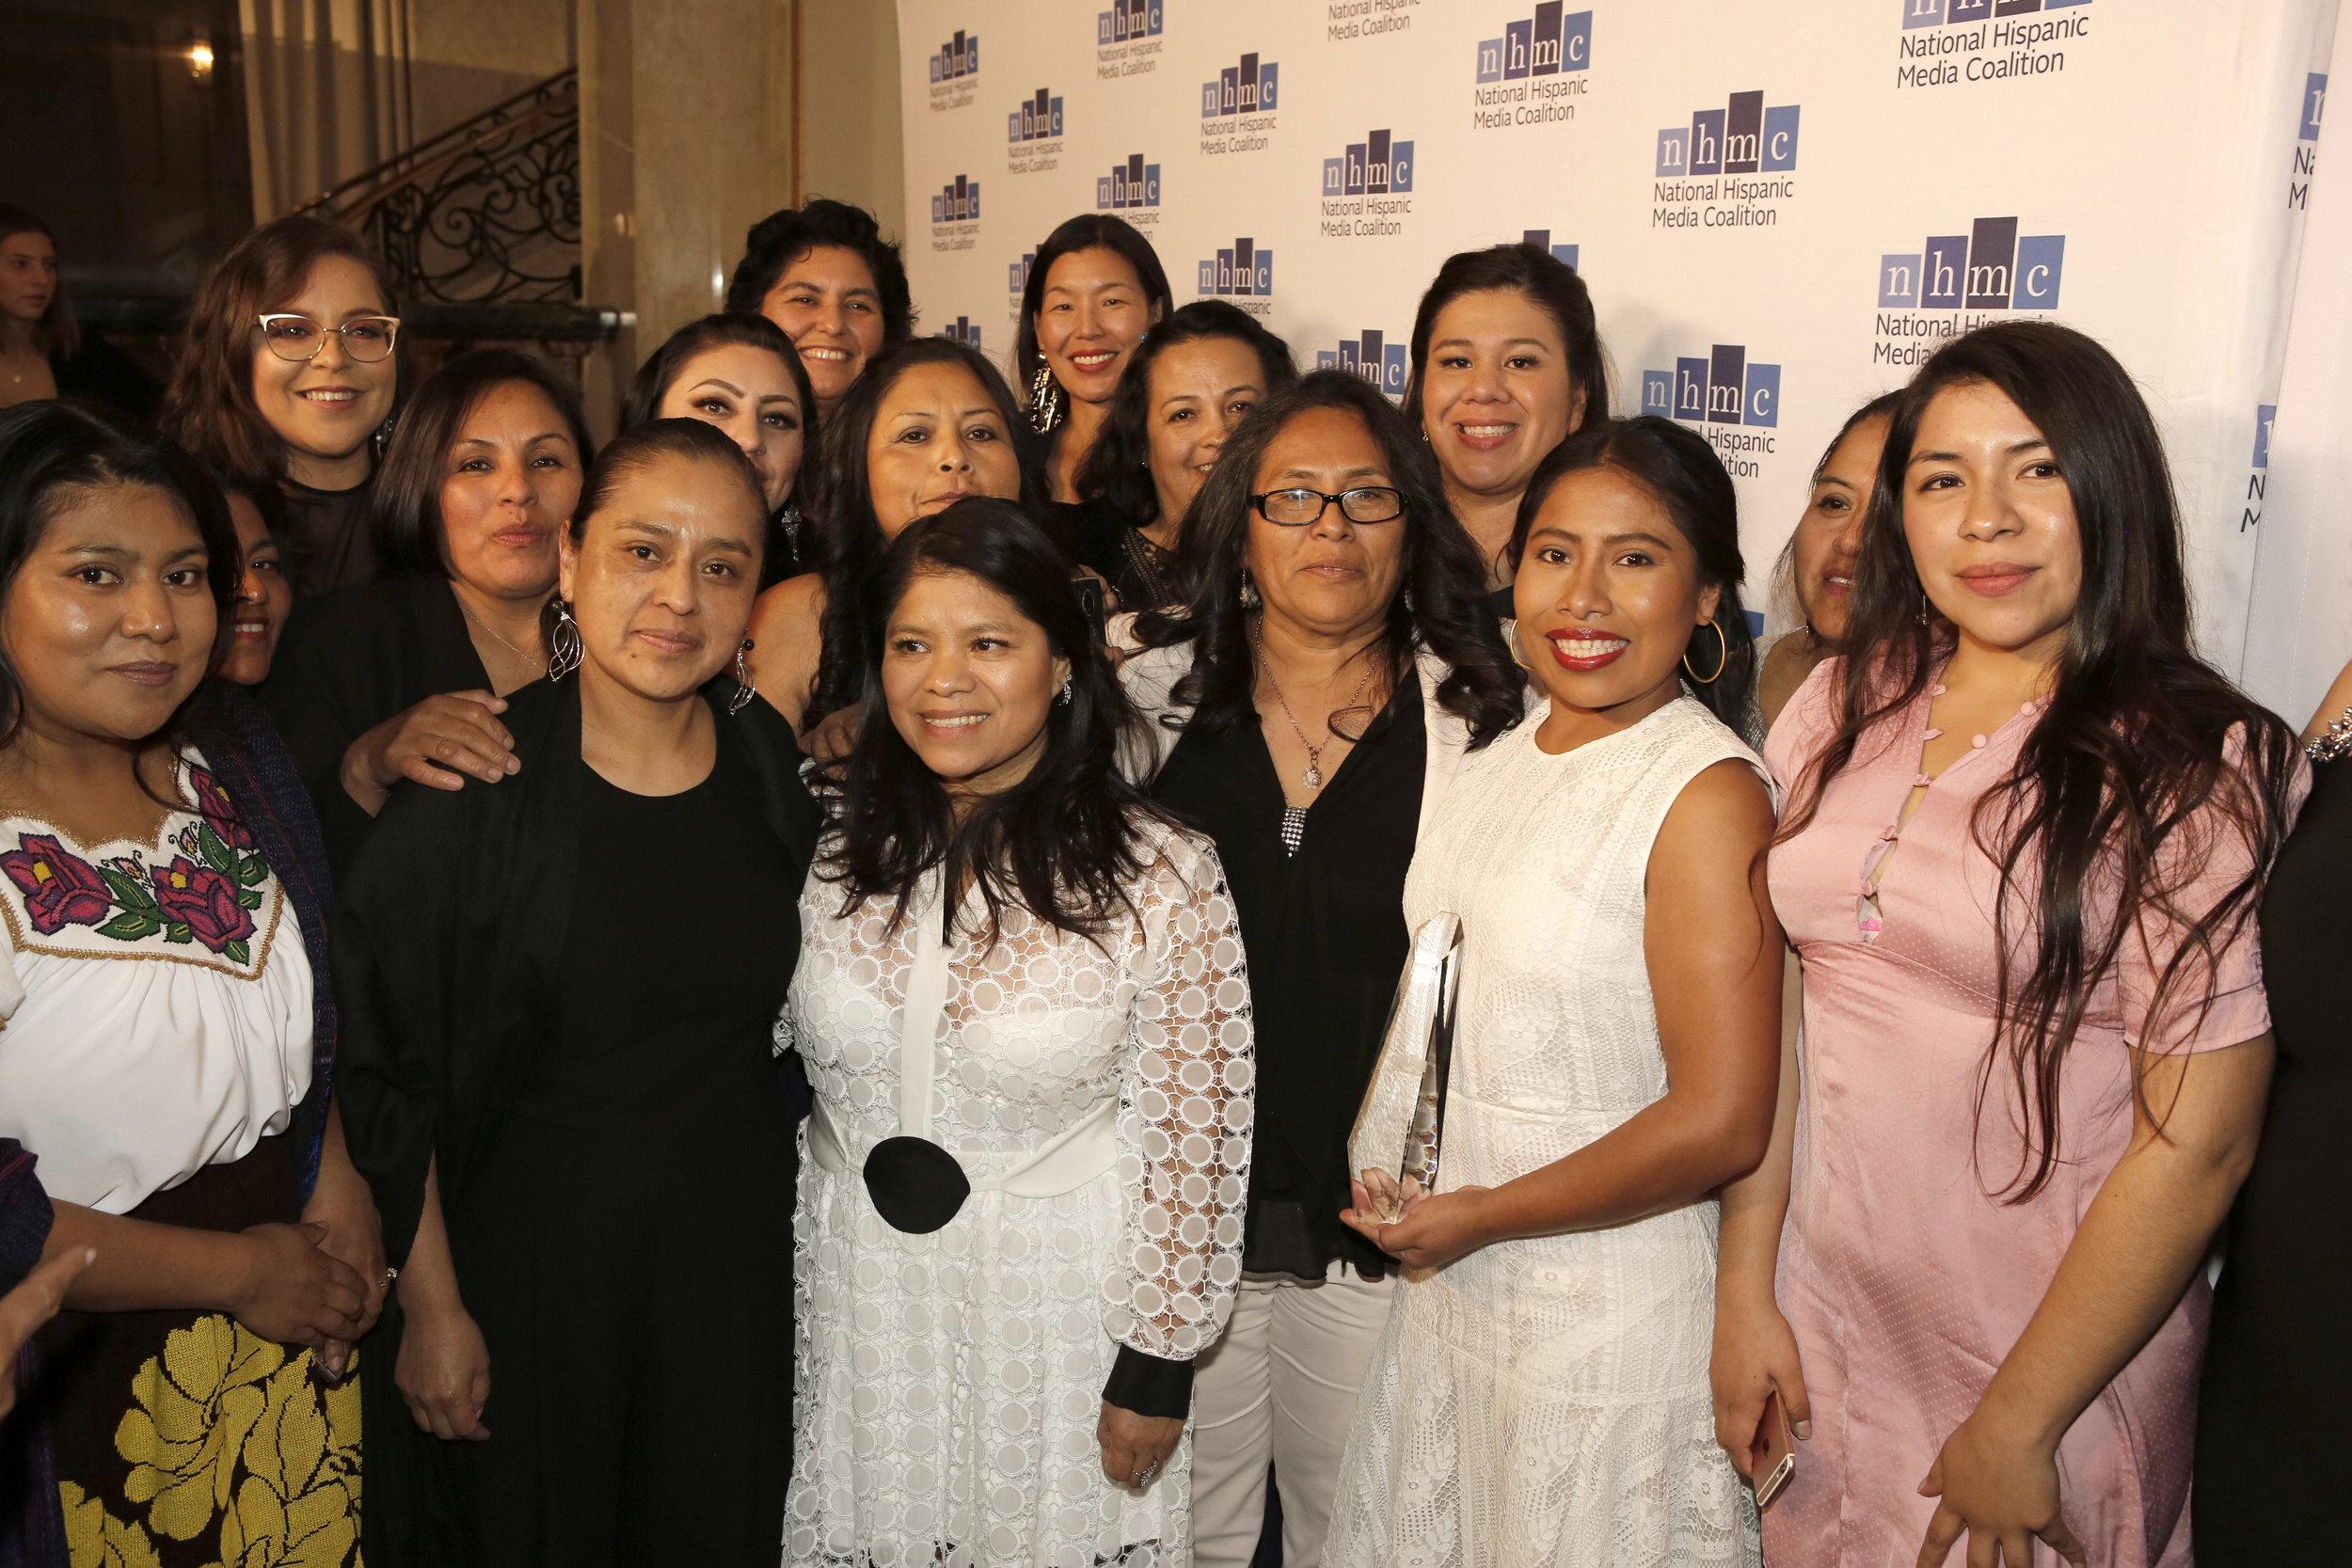 Yalitza Aparicio holding the Impact Award for Oustanding Performance in a Film, 2.22.19 © 2019, National Hispanic Media Coalition.jpg